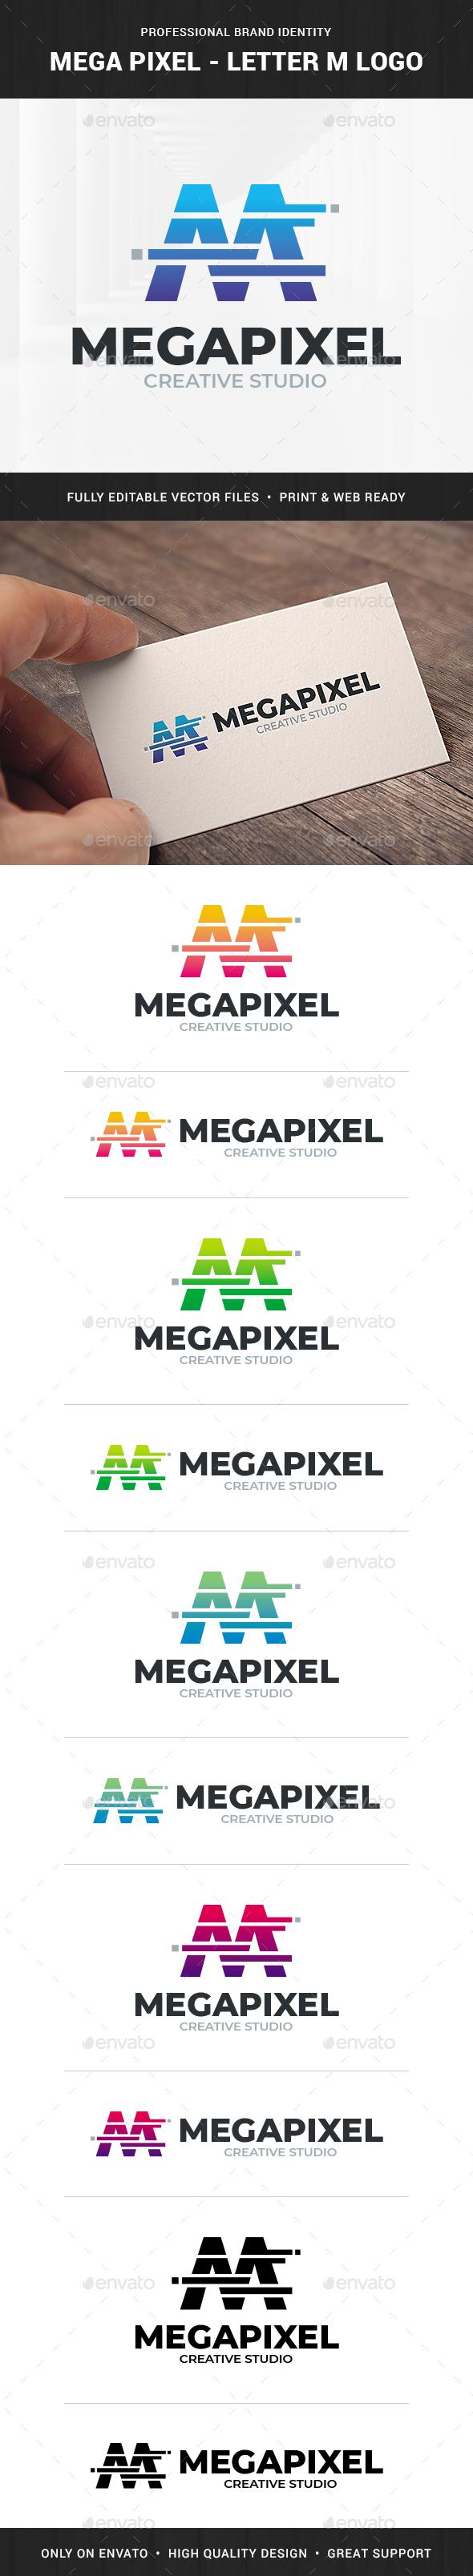 Mega Pixel - Letter M Logo